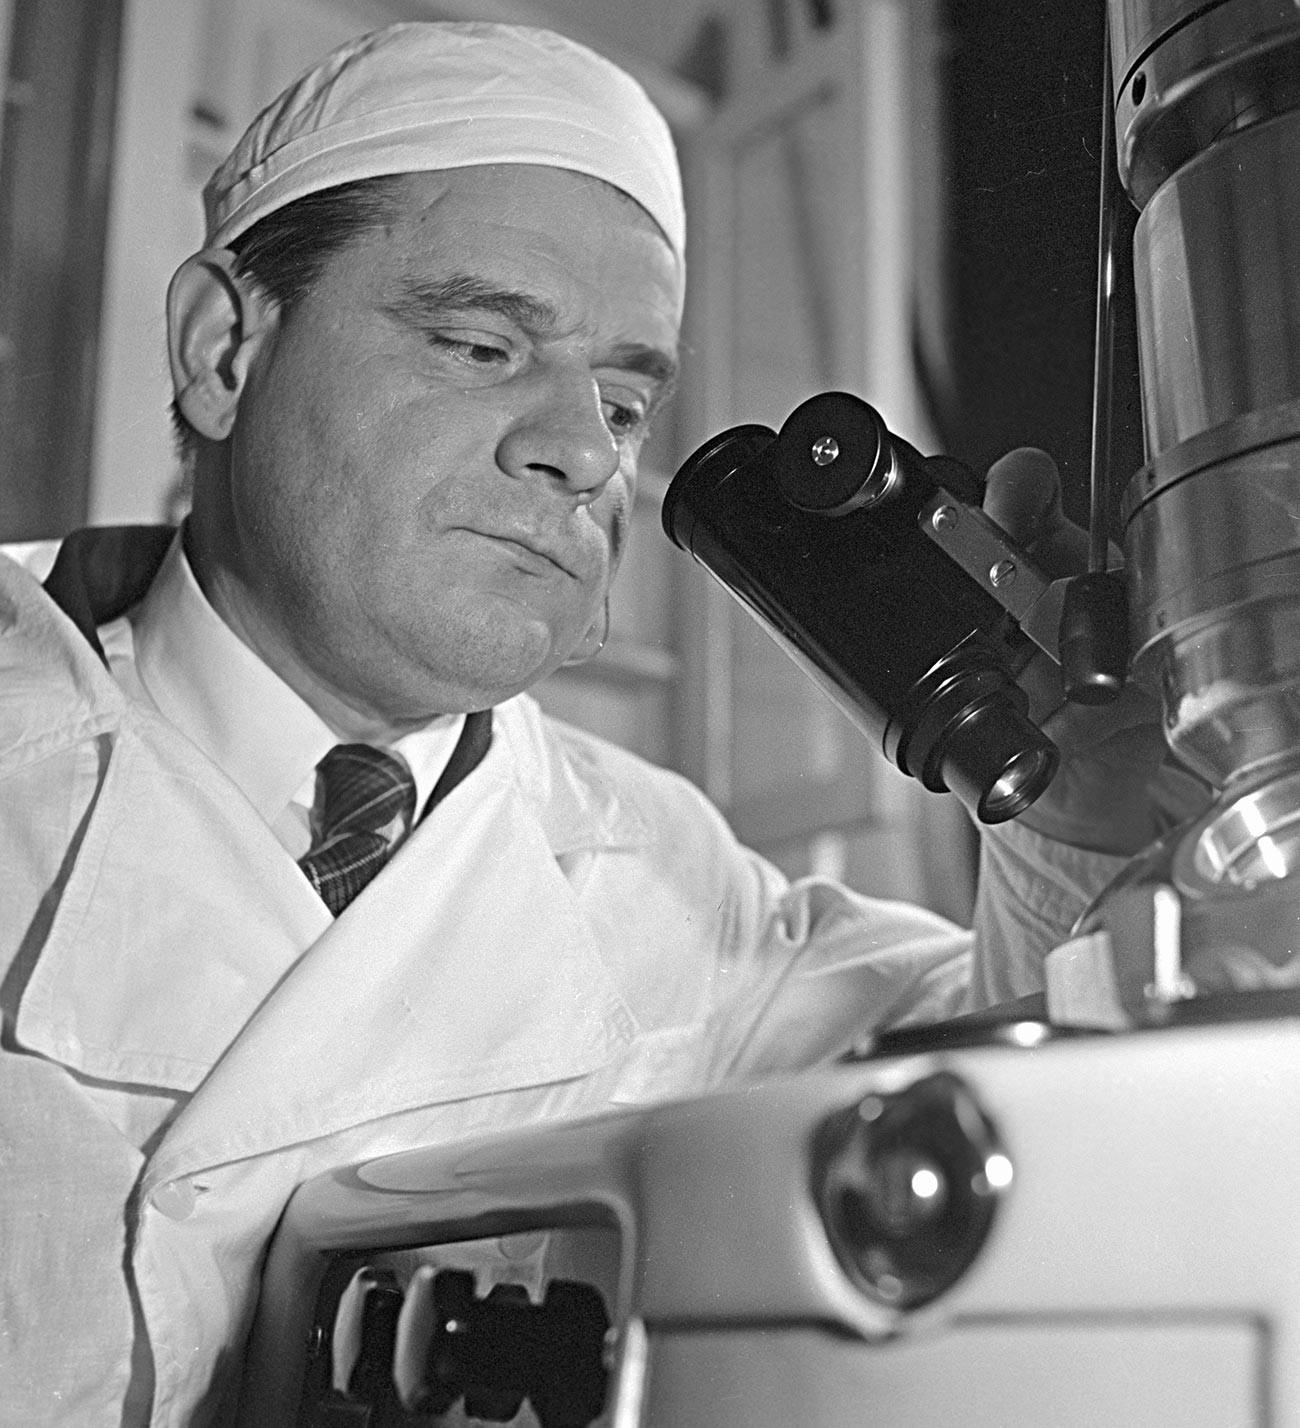 Mikhail Chumakov, Direktur Institut Poliomyelitis dan anggota asosiasi Akademi Ilmu Kedokteran.